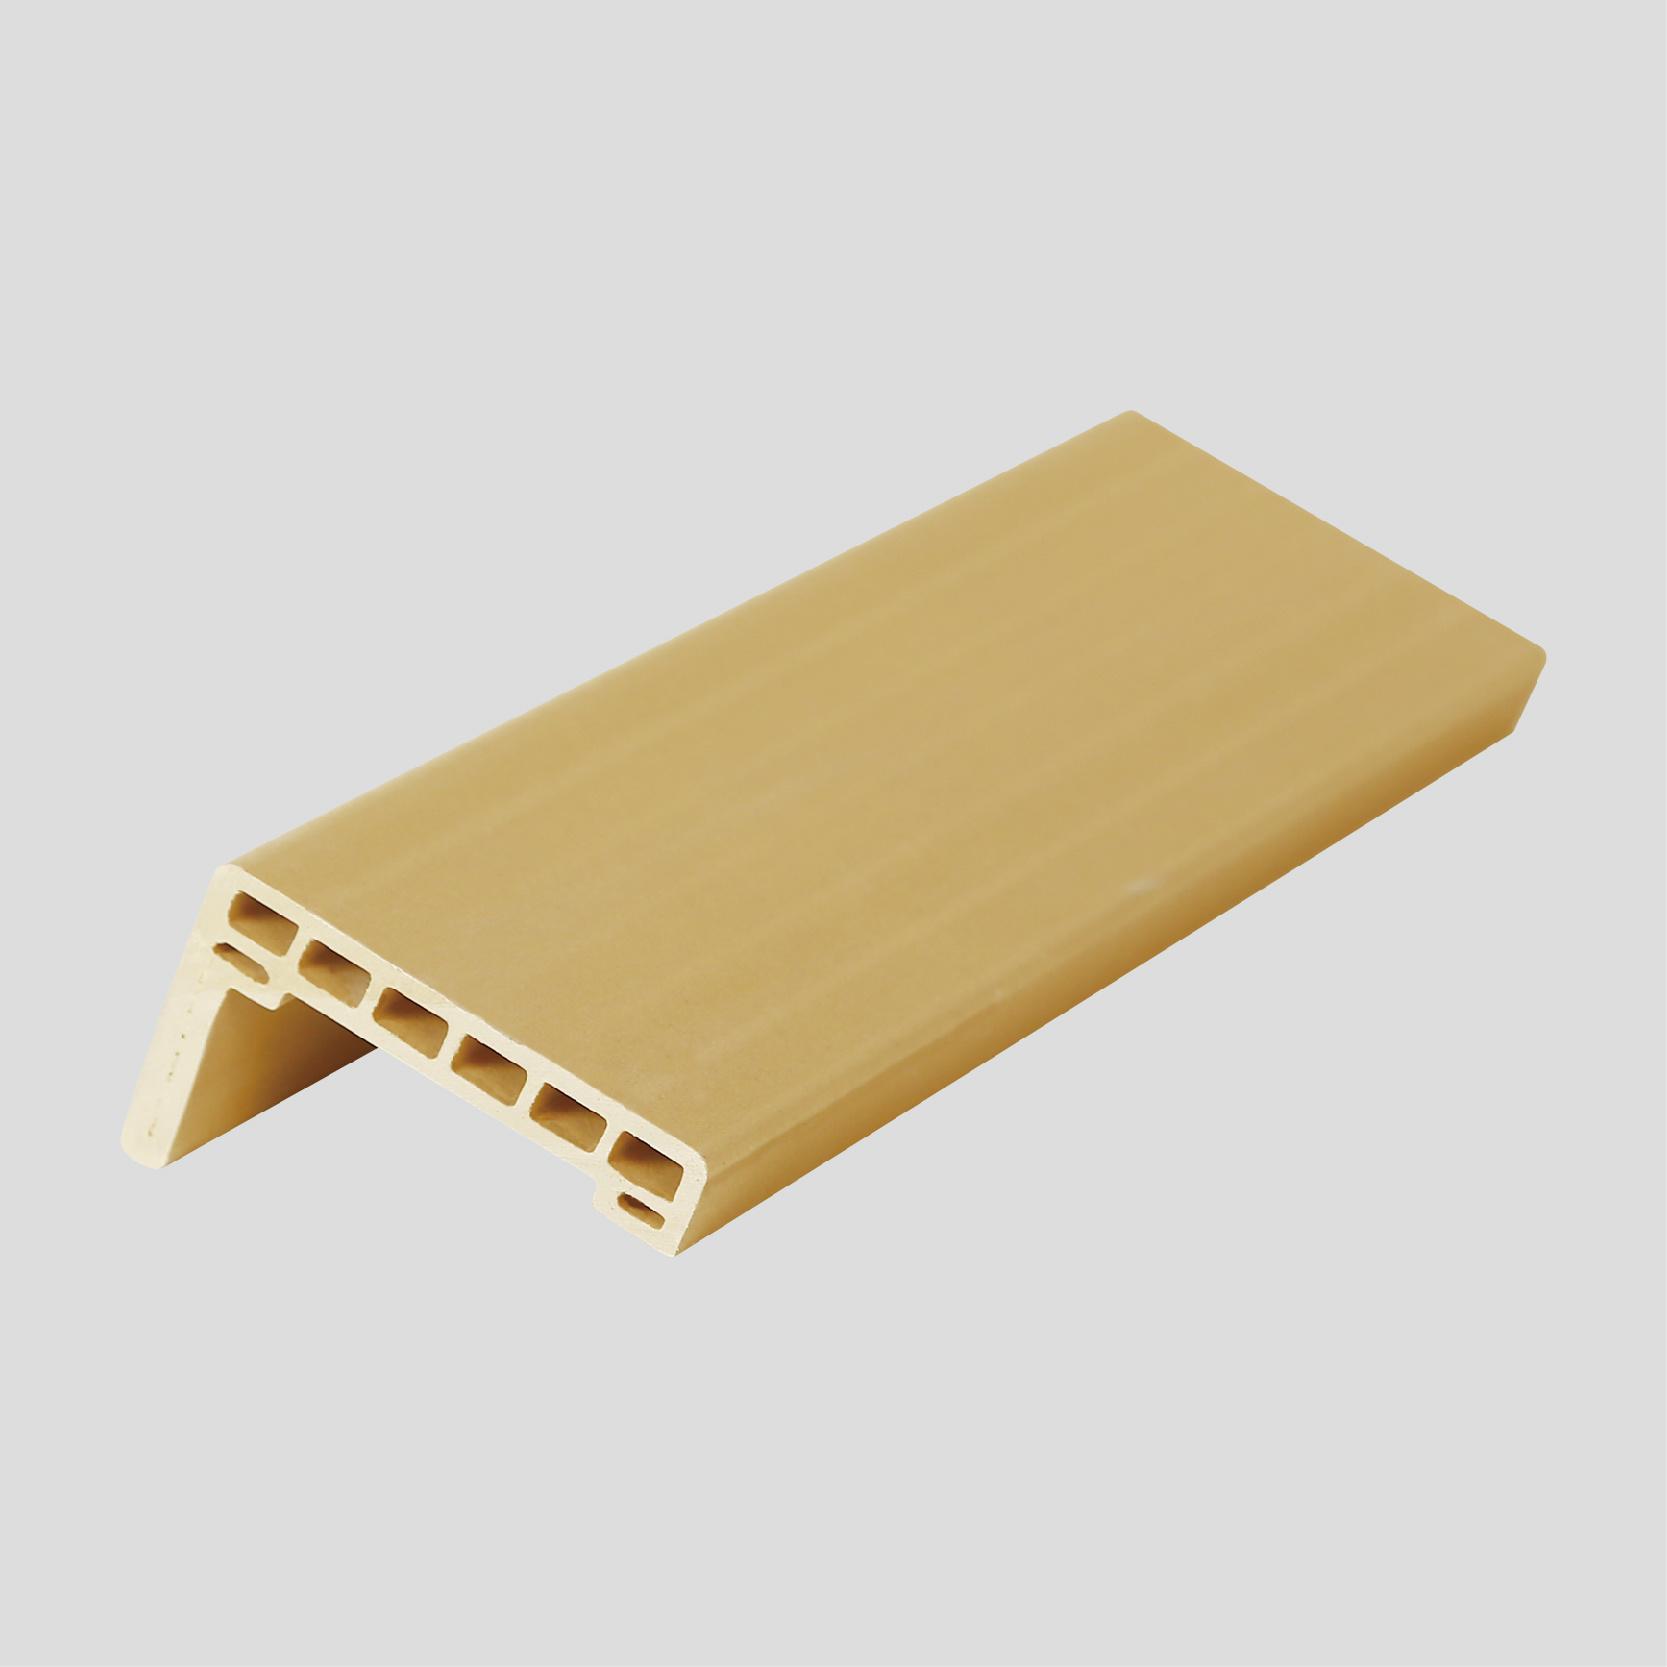 Eco-Friendly Wood Plastic Composite 5.8mm Architrave Door Profile (MT-6022)